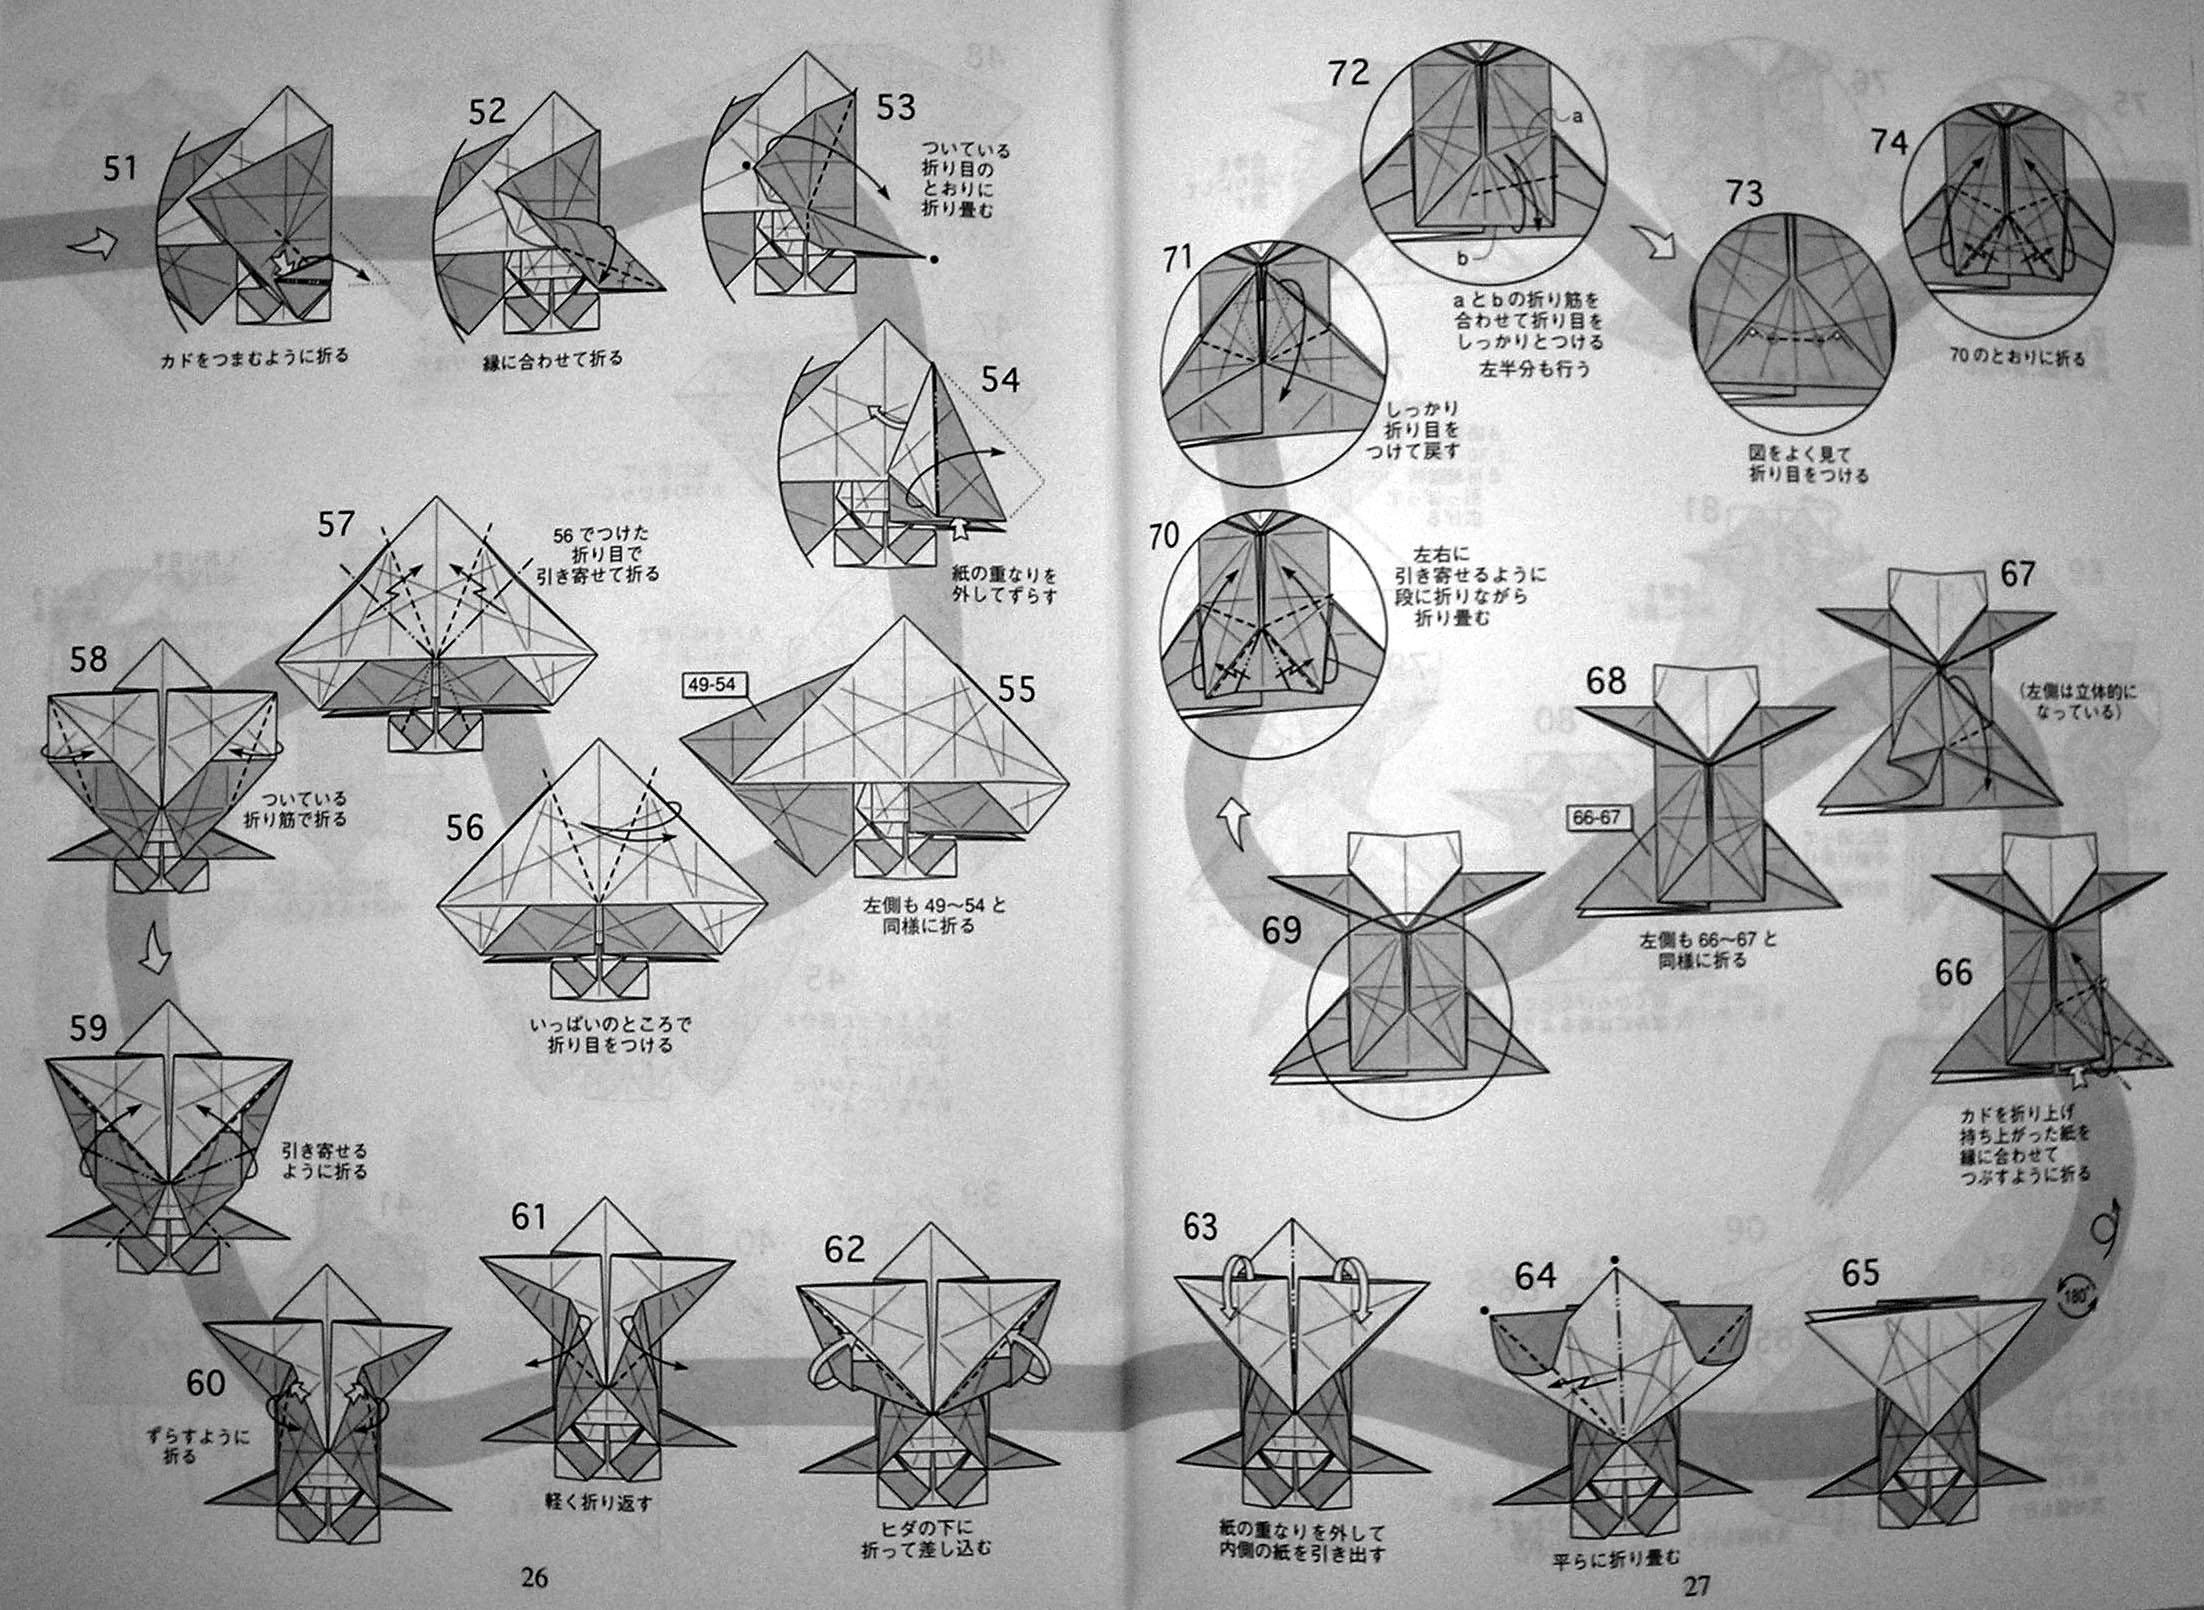 Horse By Hideo Komatsu Here Is The Folding Diagram For Shuriken This Came Komatsu3